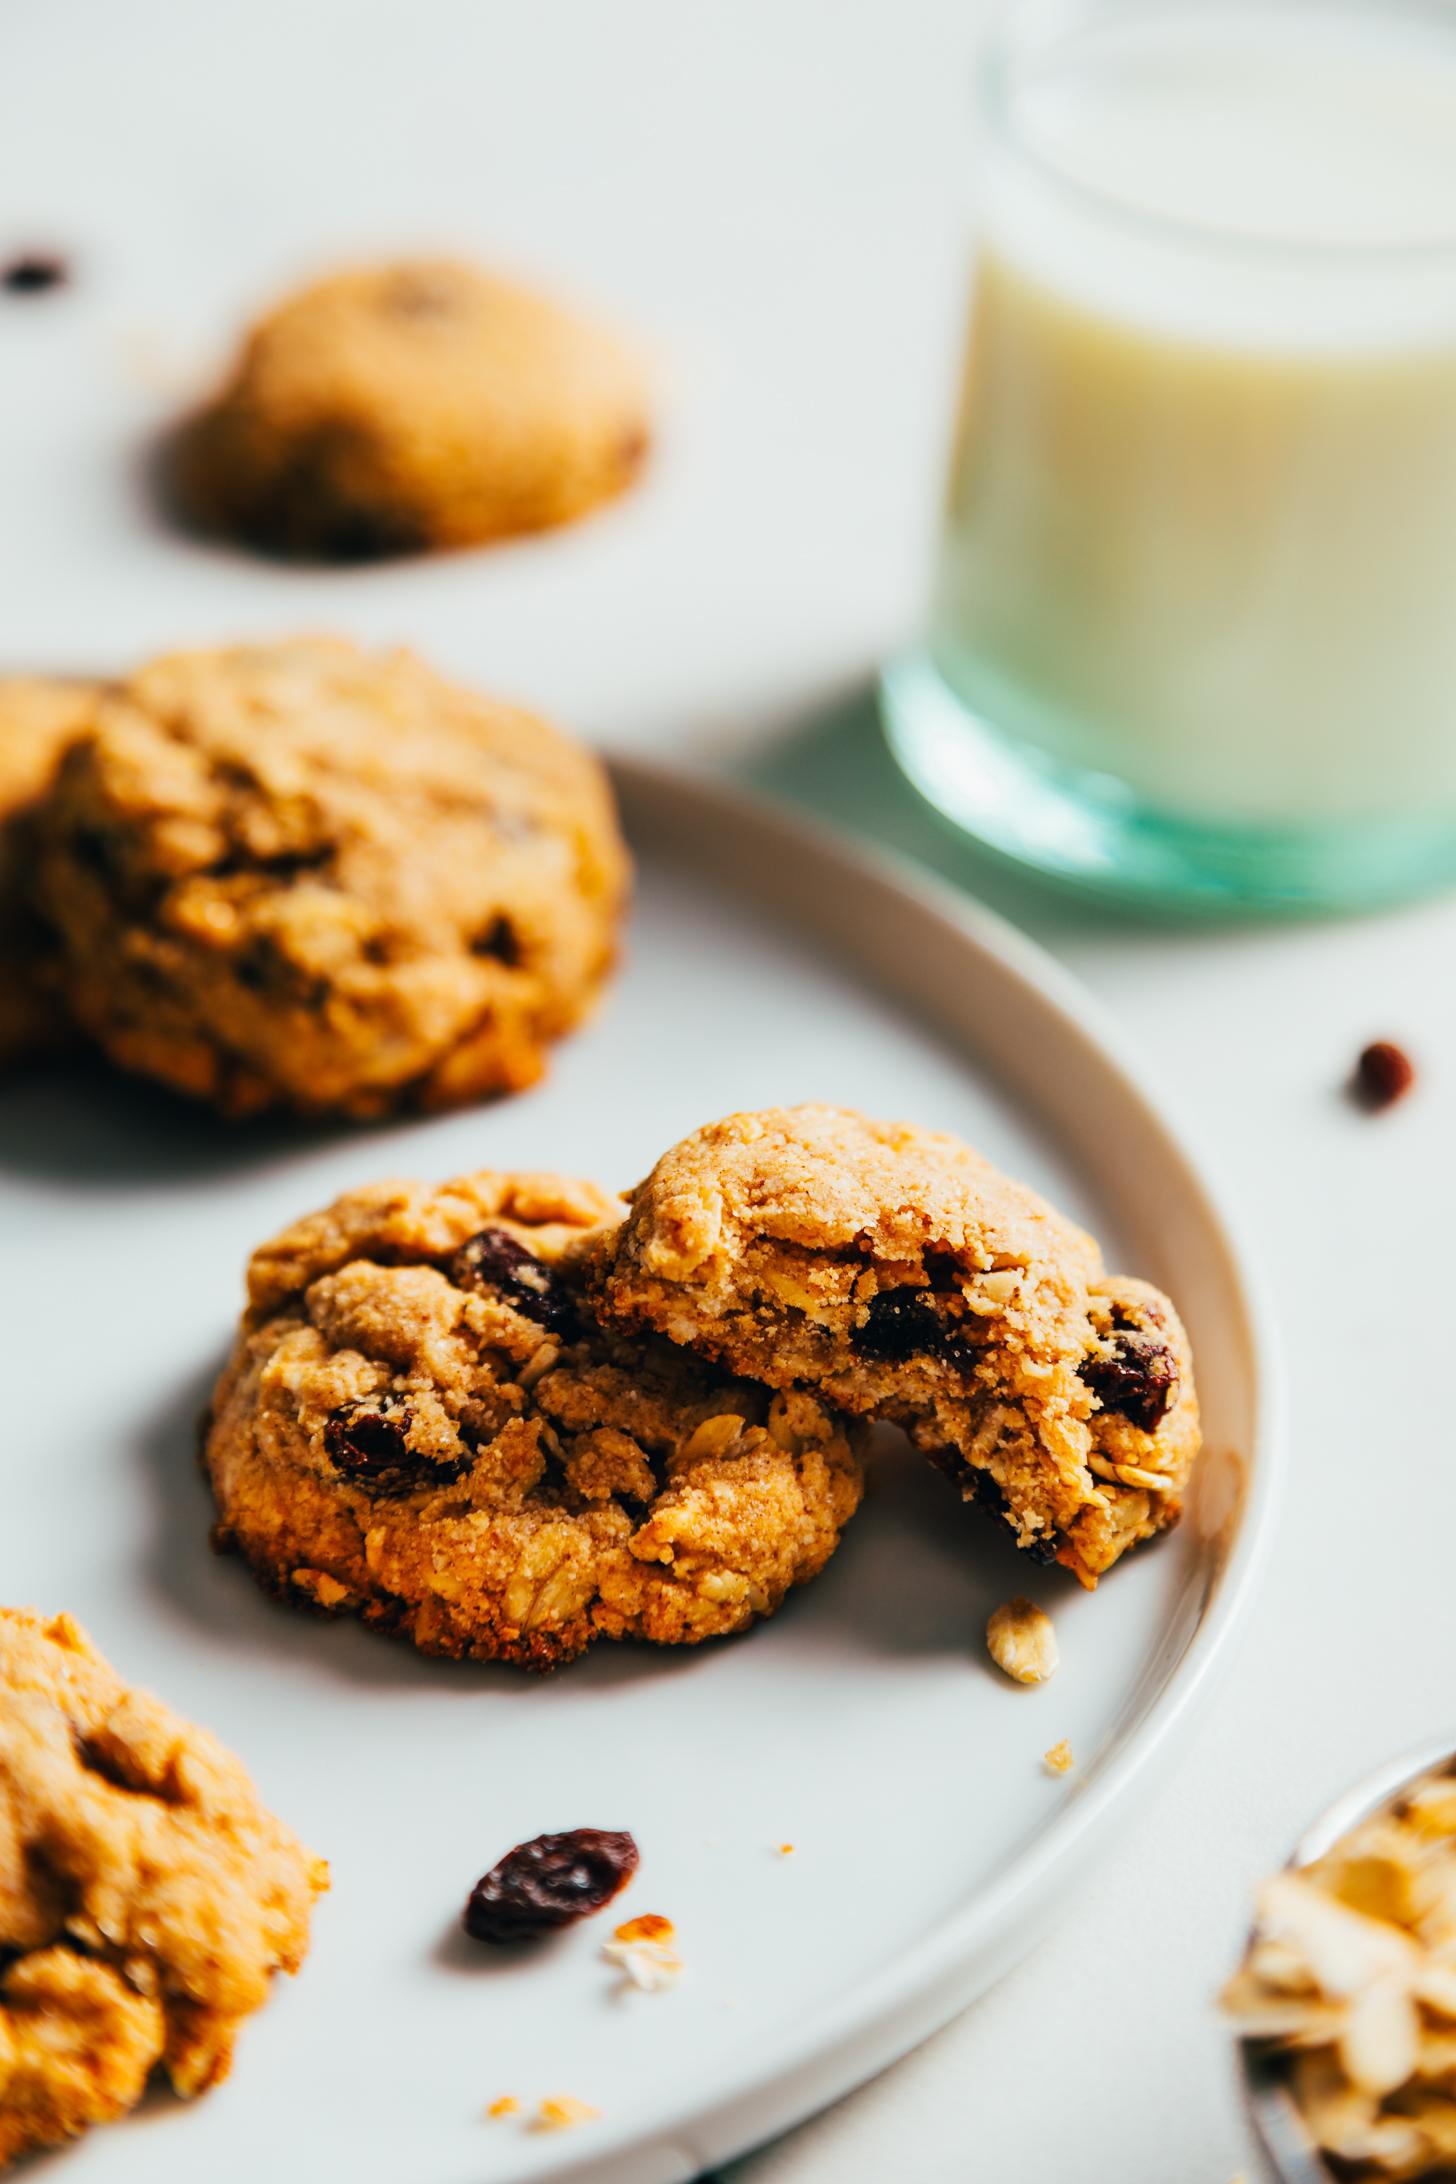 Vegan oatmeal raisin cookies on a plate